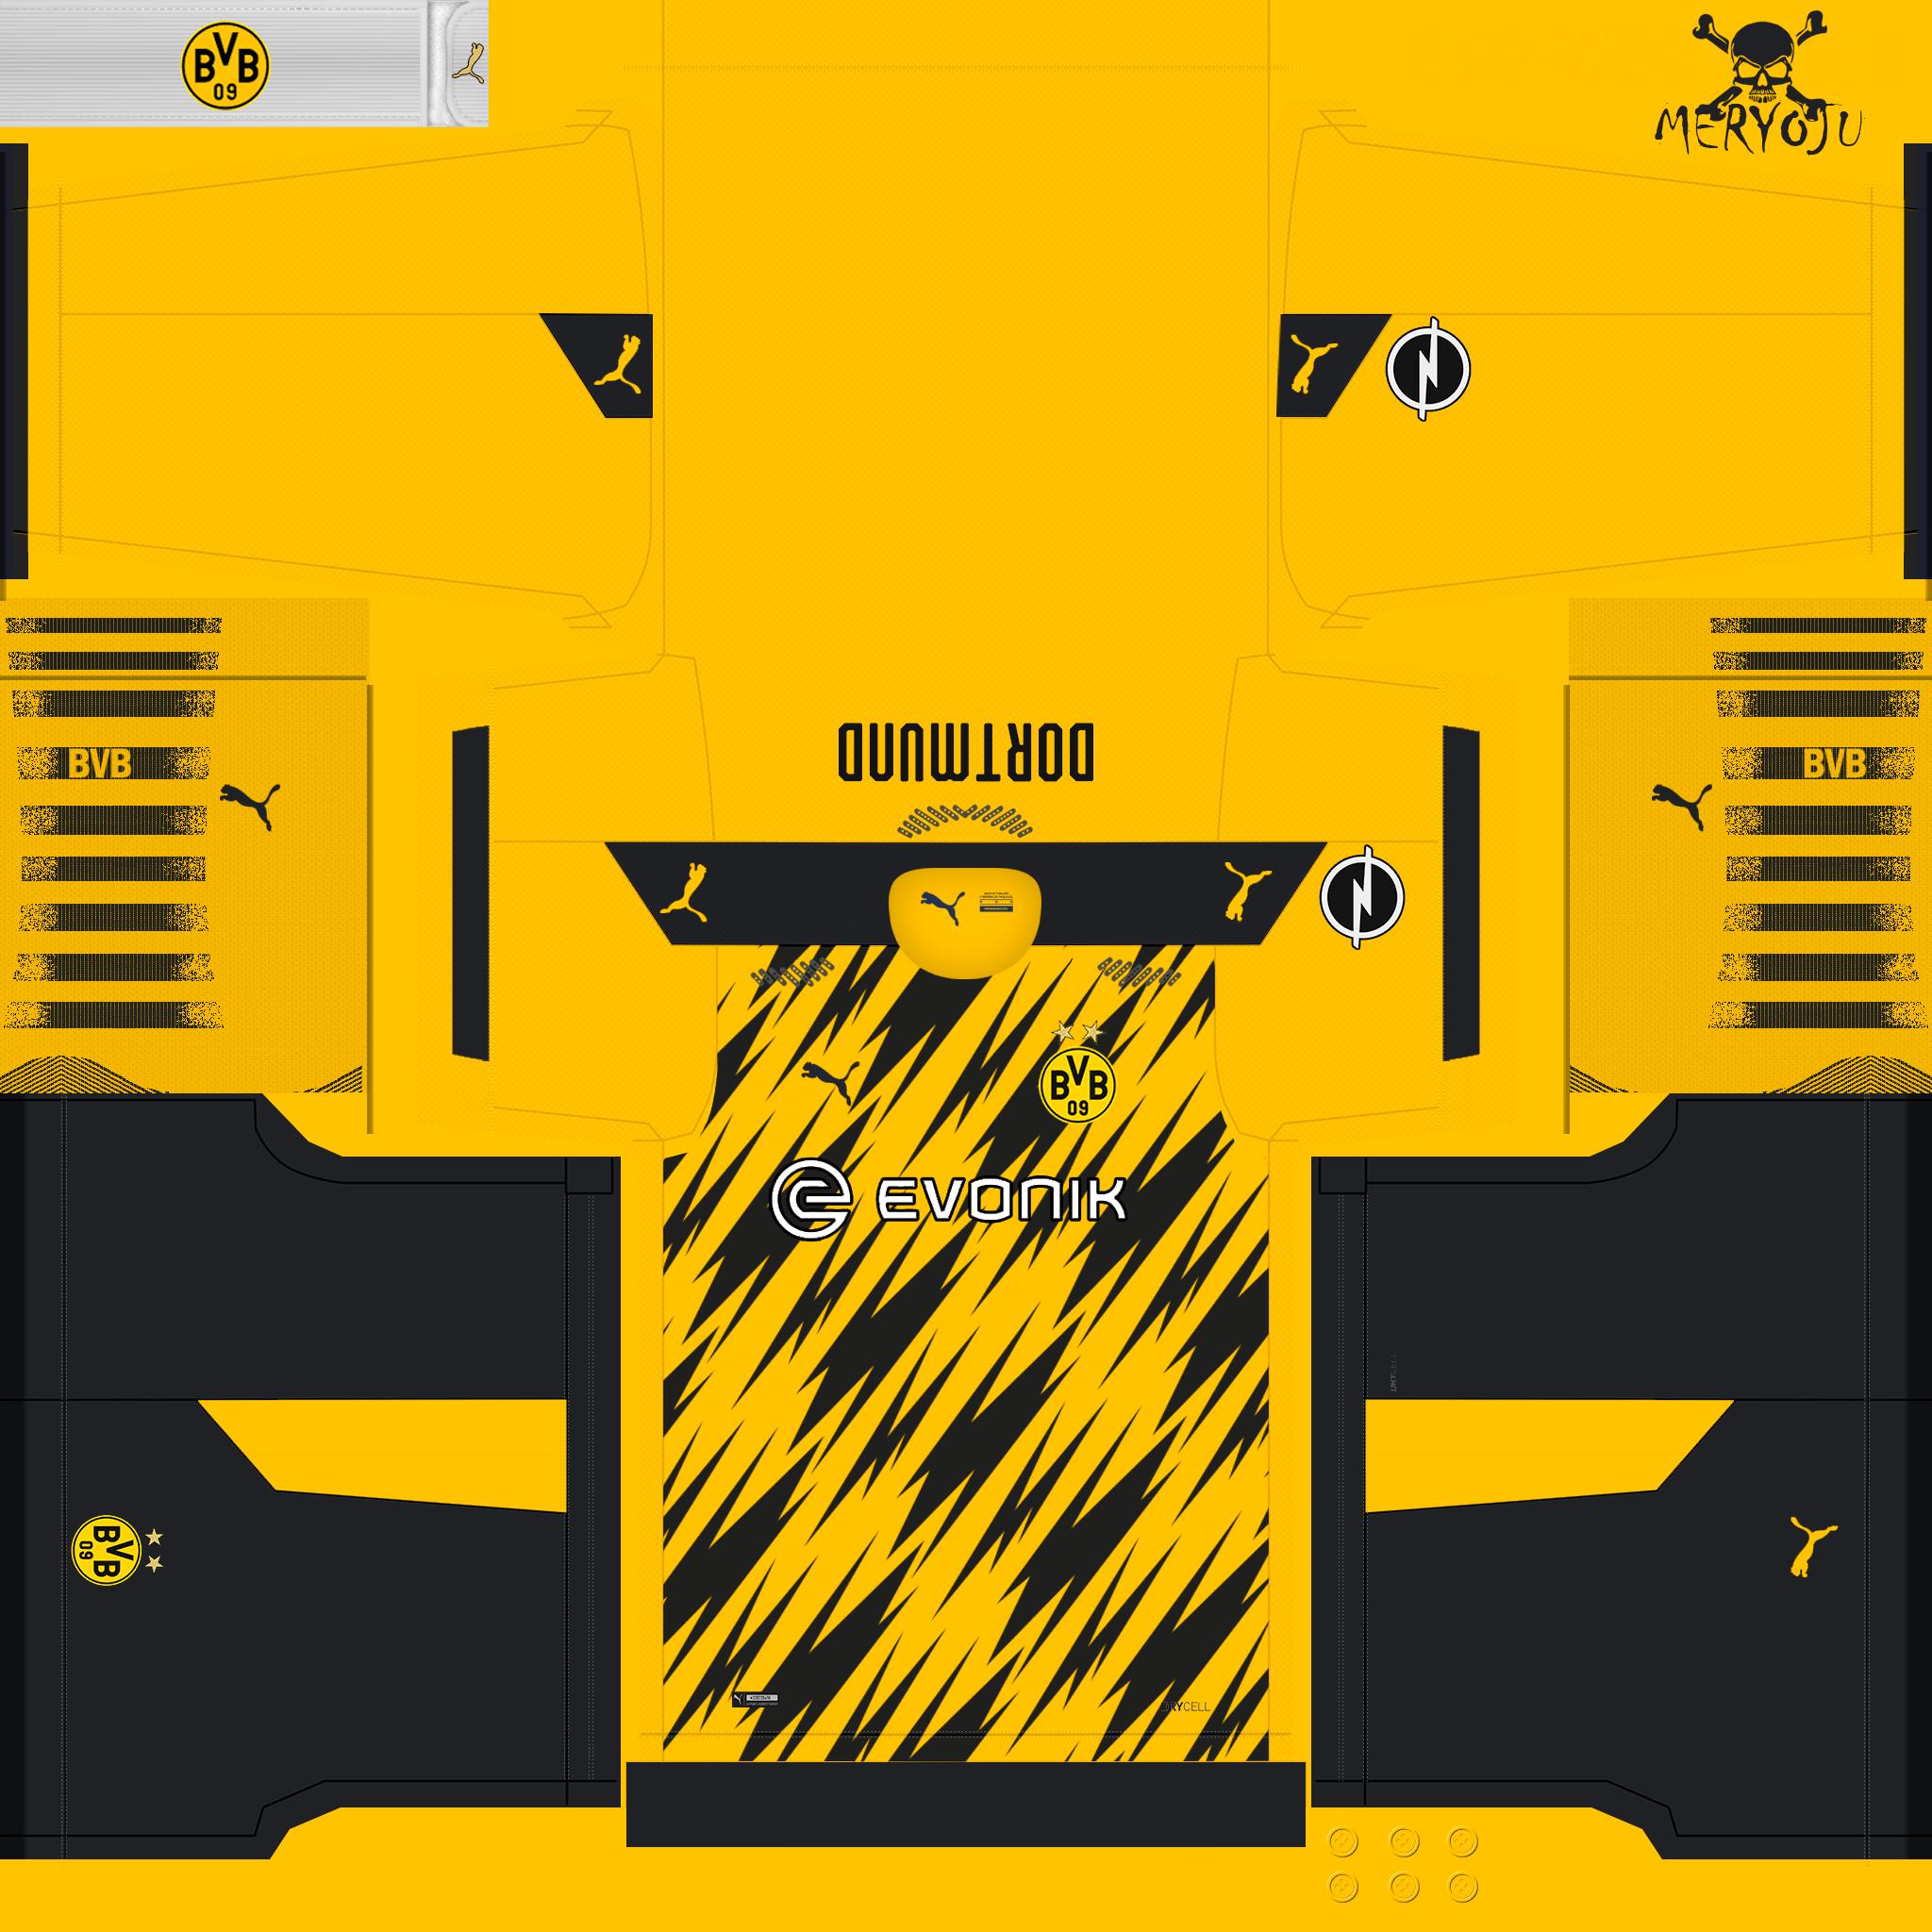 Kits Borussia Dortmund 2020/2021 by Meryoju